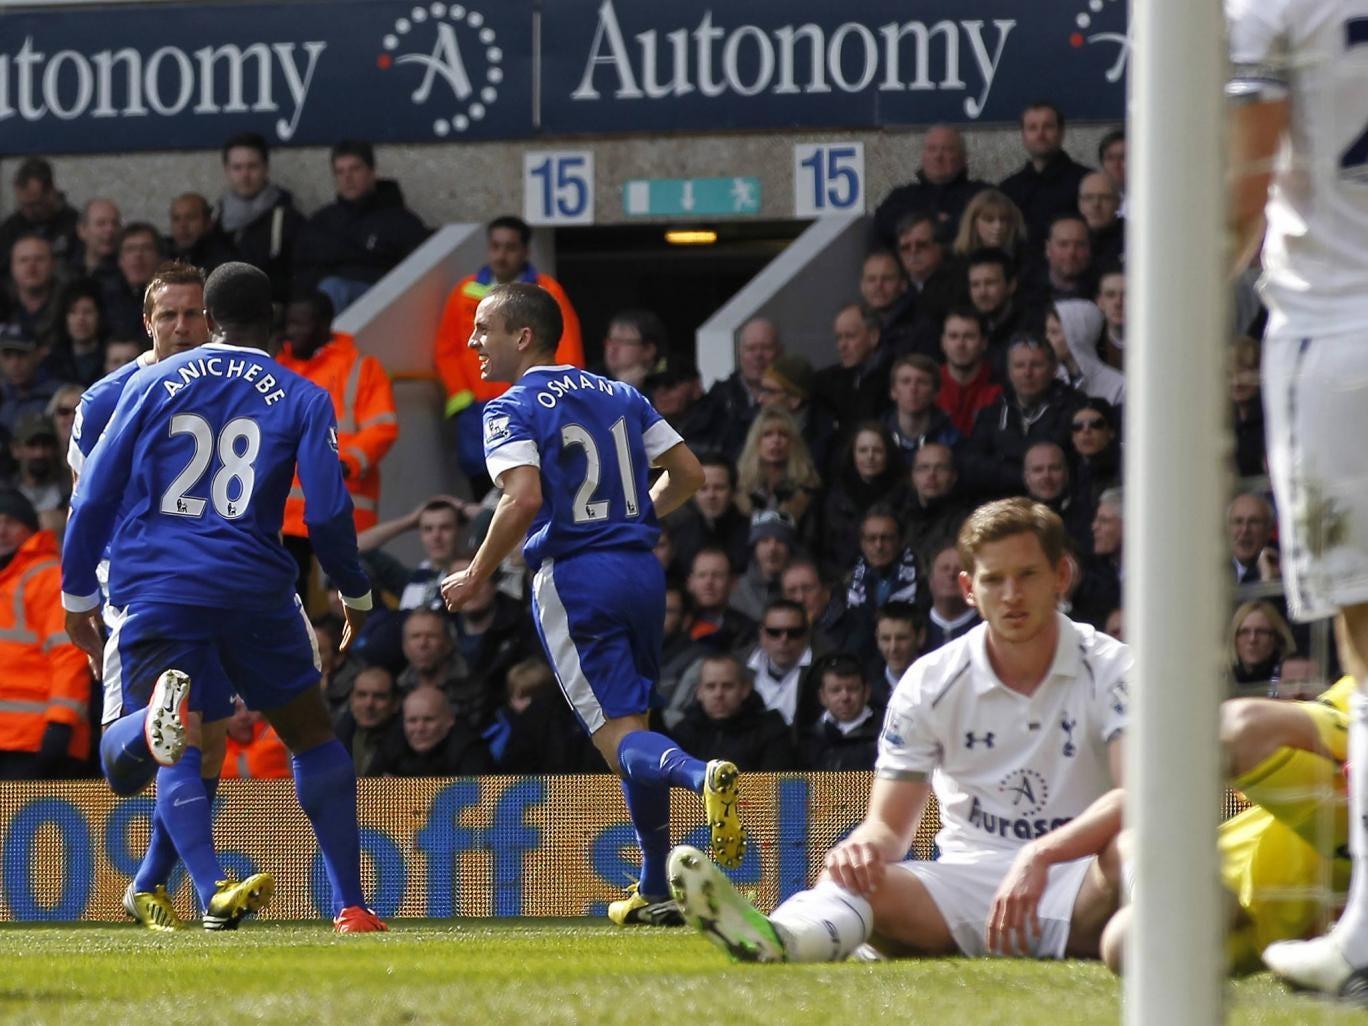 Phil Jagielka of Everton celebrates after scoring against Tottenham